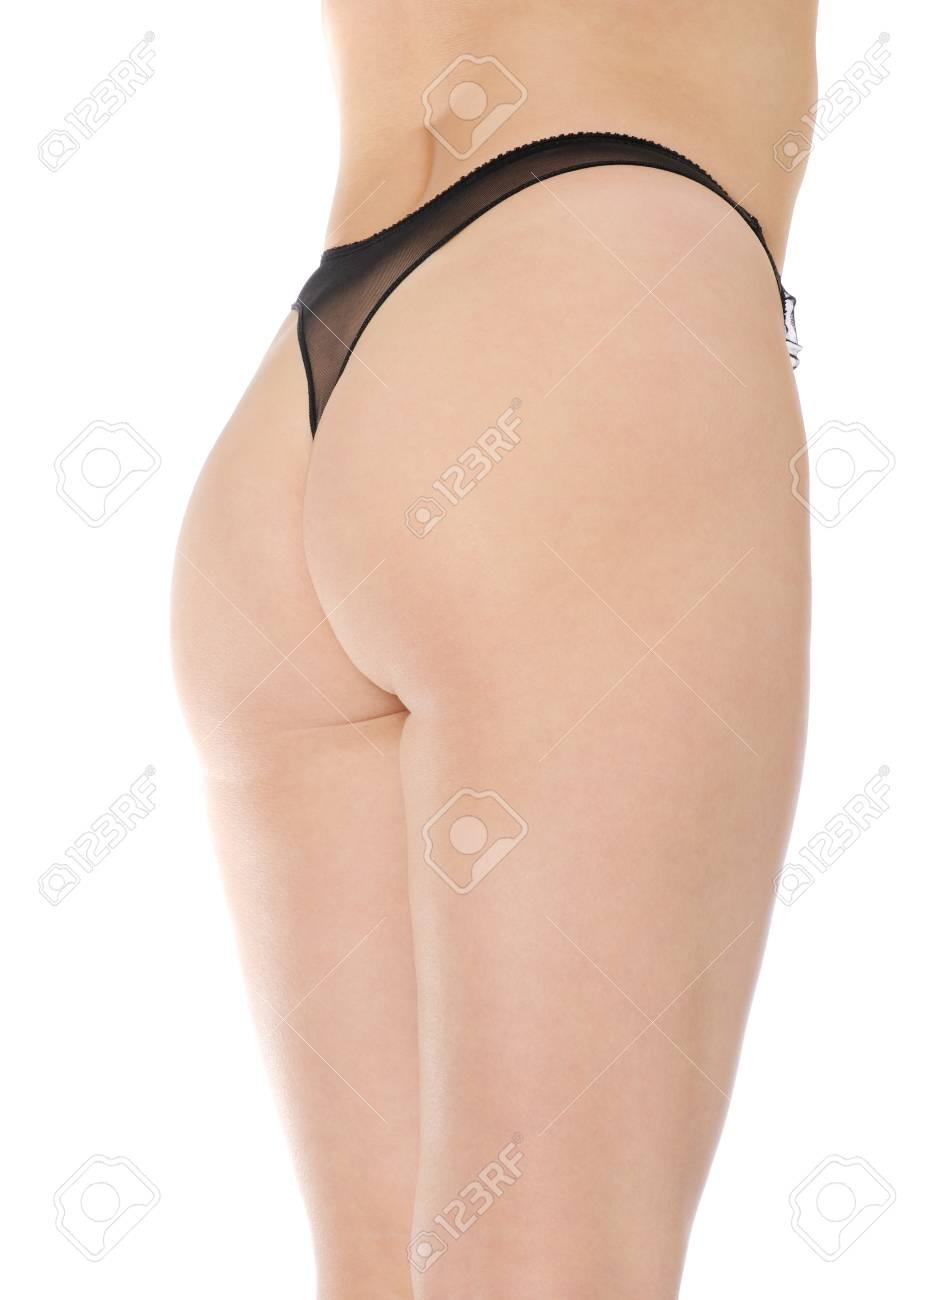 Beautiful woman body isolated on white background Stock Photo - 9086649